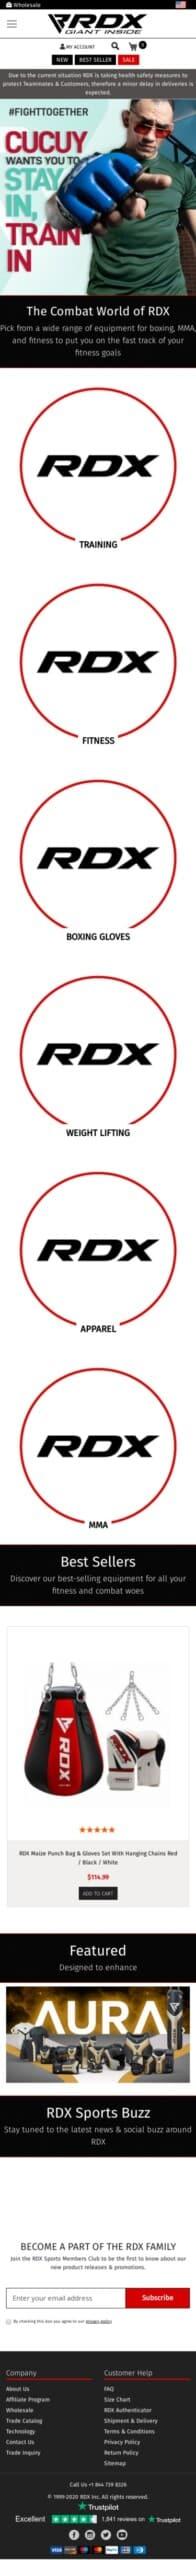 RDX Sports Coupon